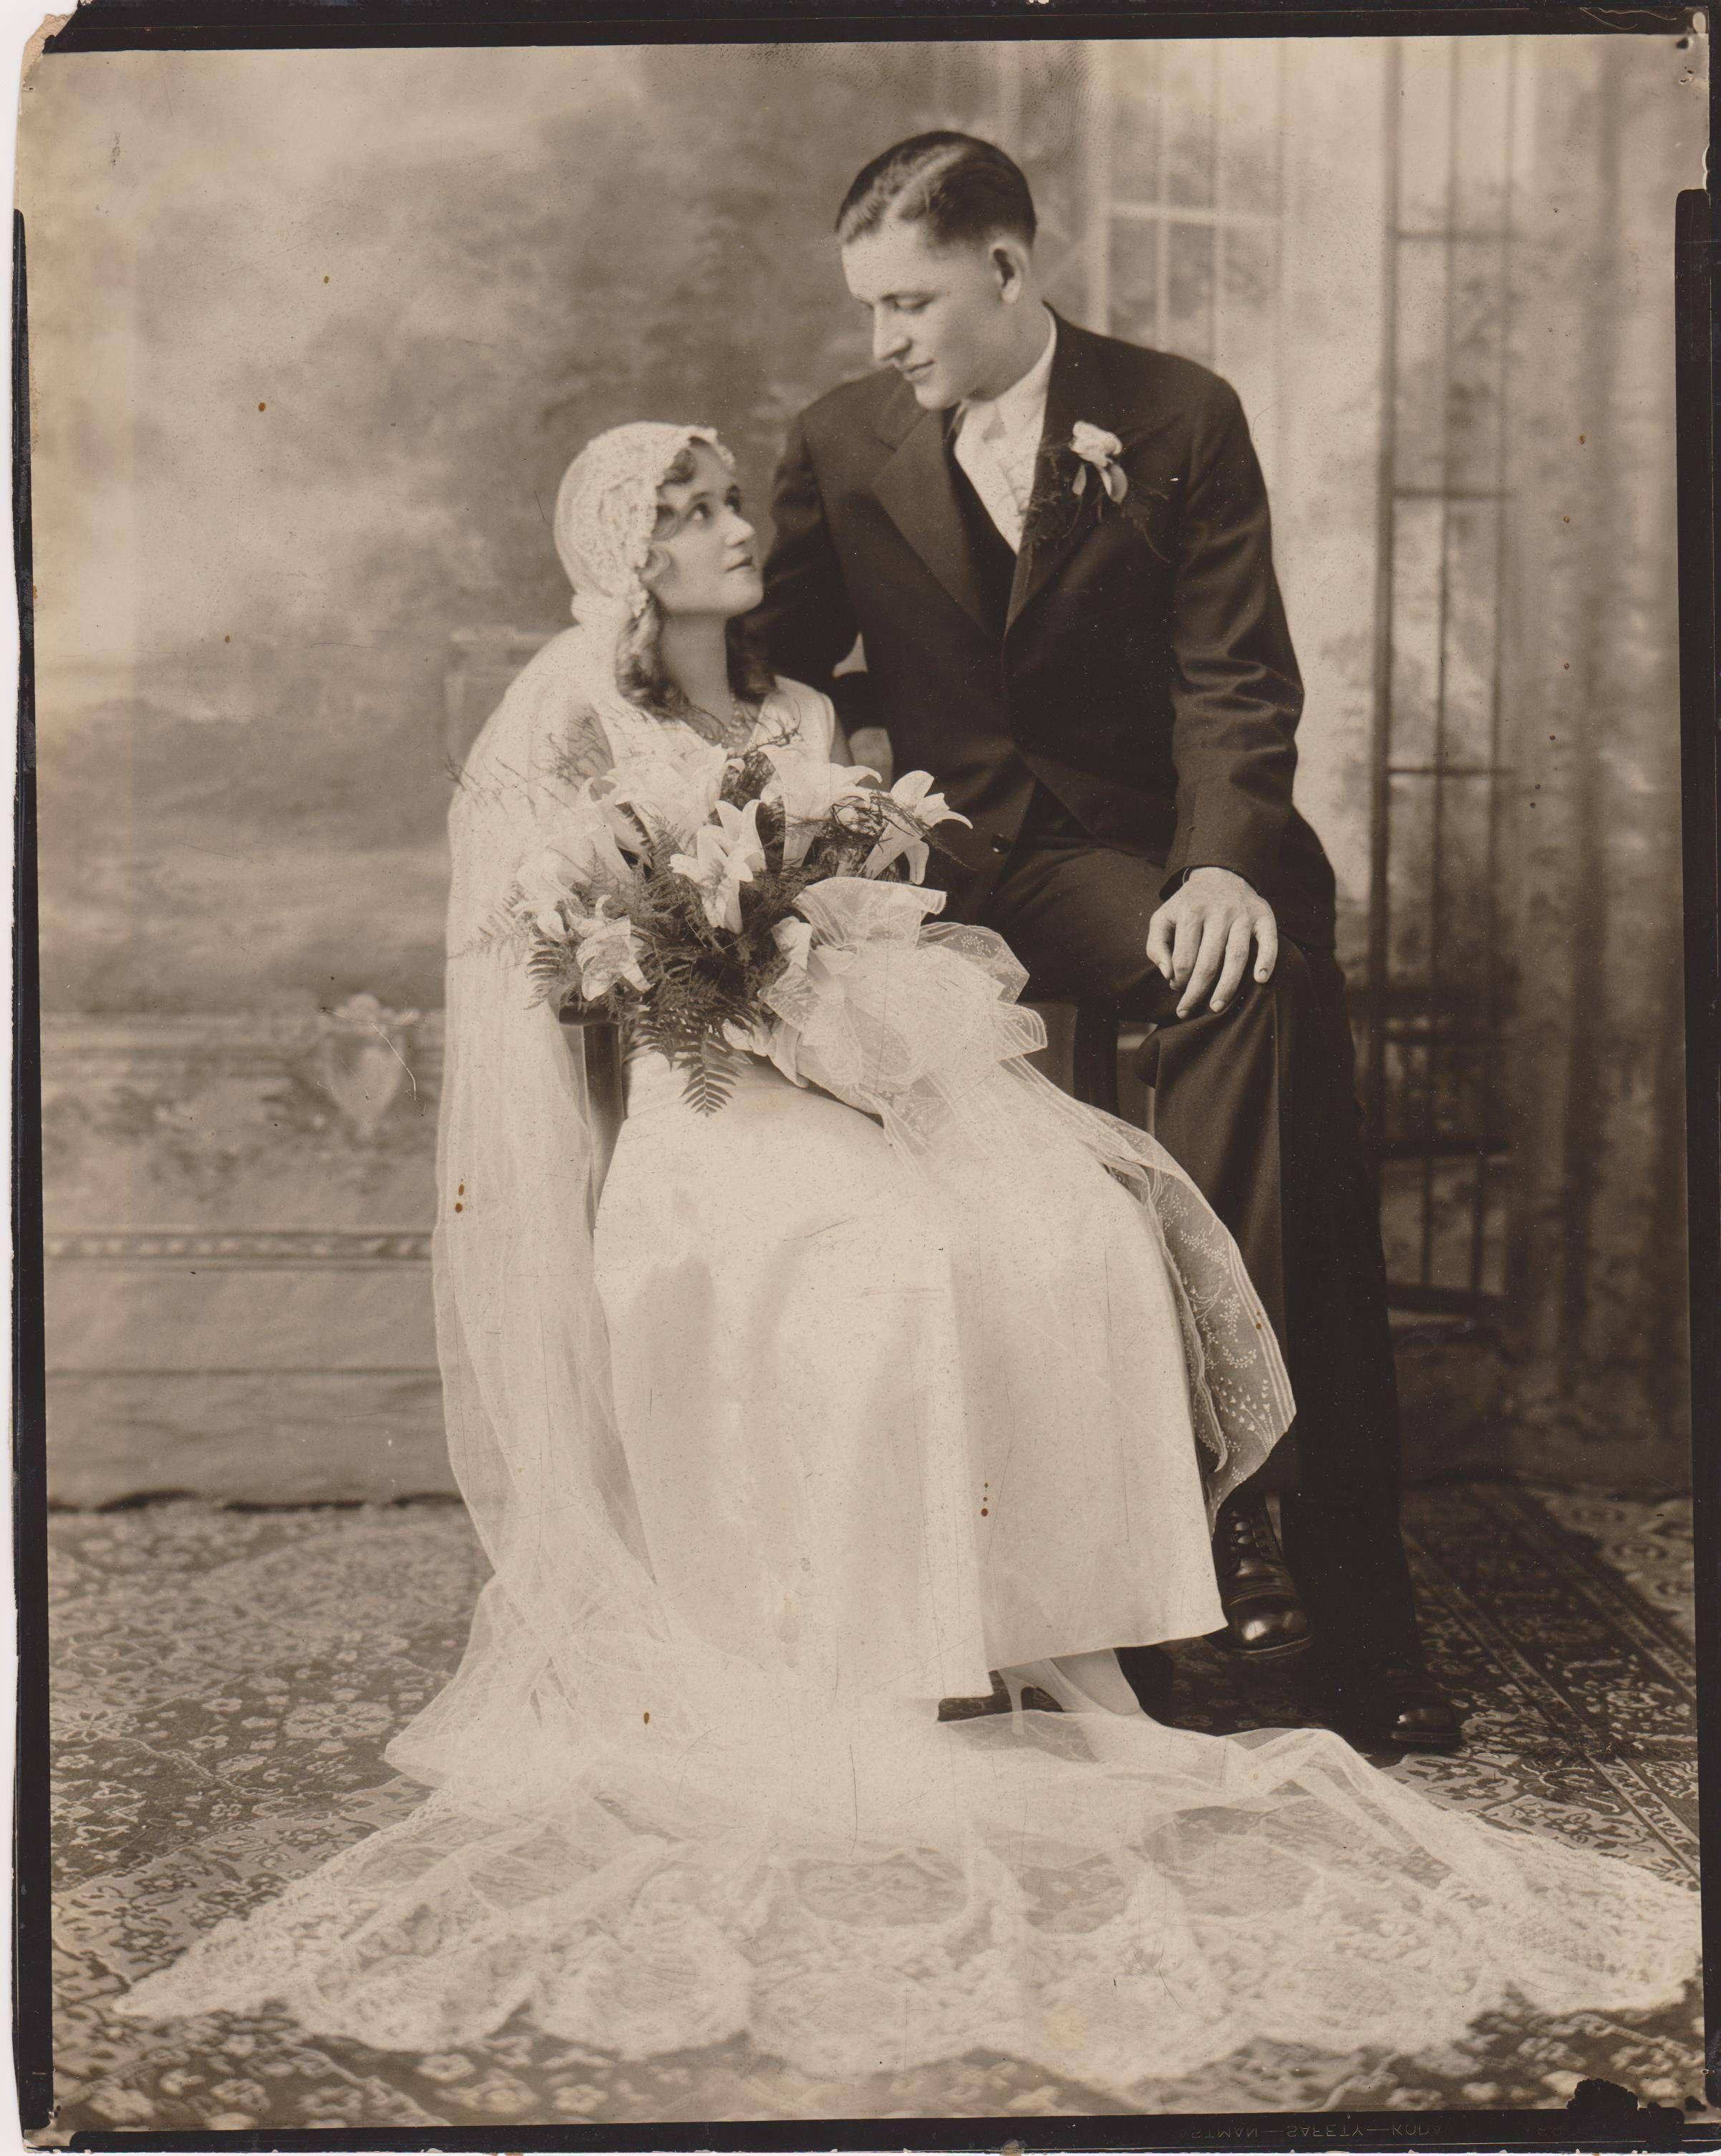 Vintage Wedding Pics That Make Us Nostalgic For Old -8152